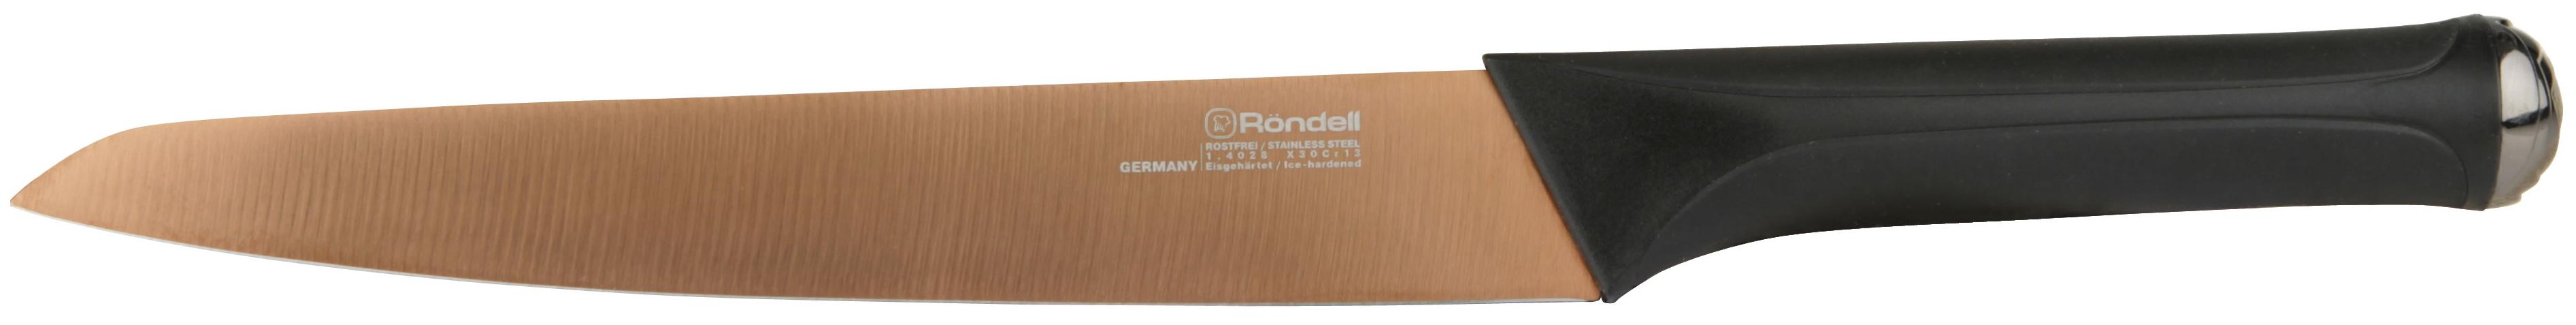 Нож кухонный Röndell RD-691 20 см от Rondell